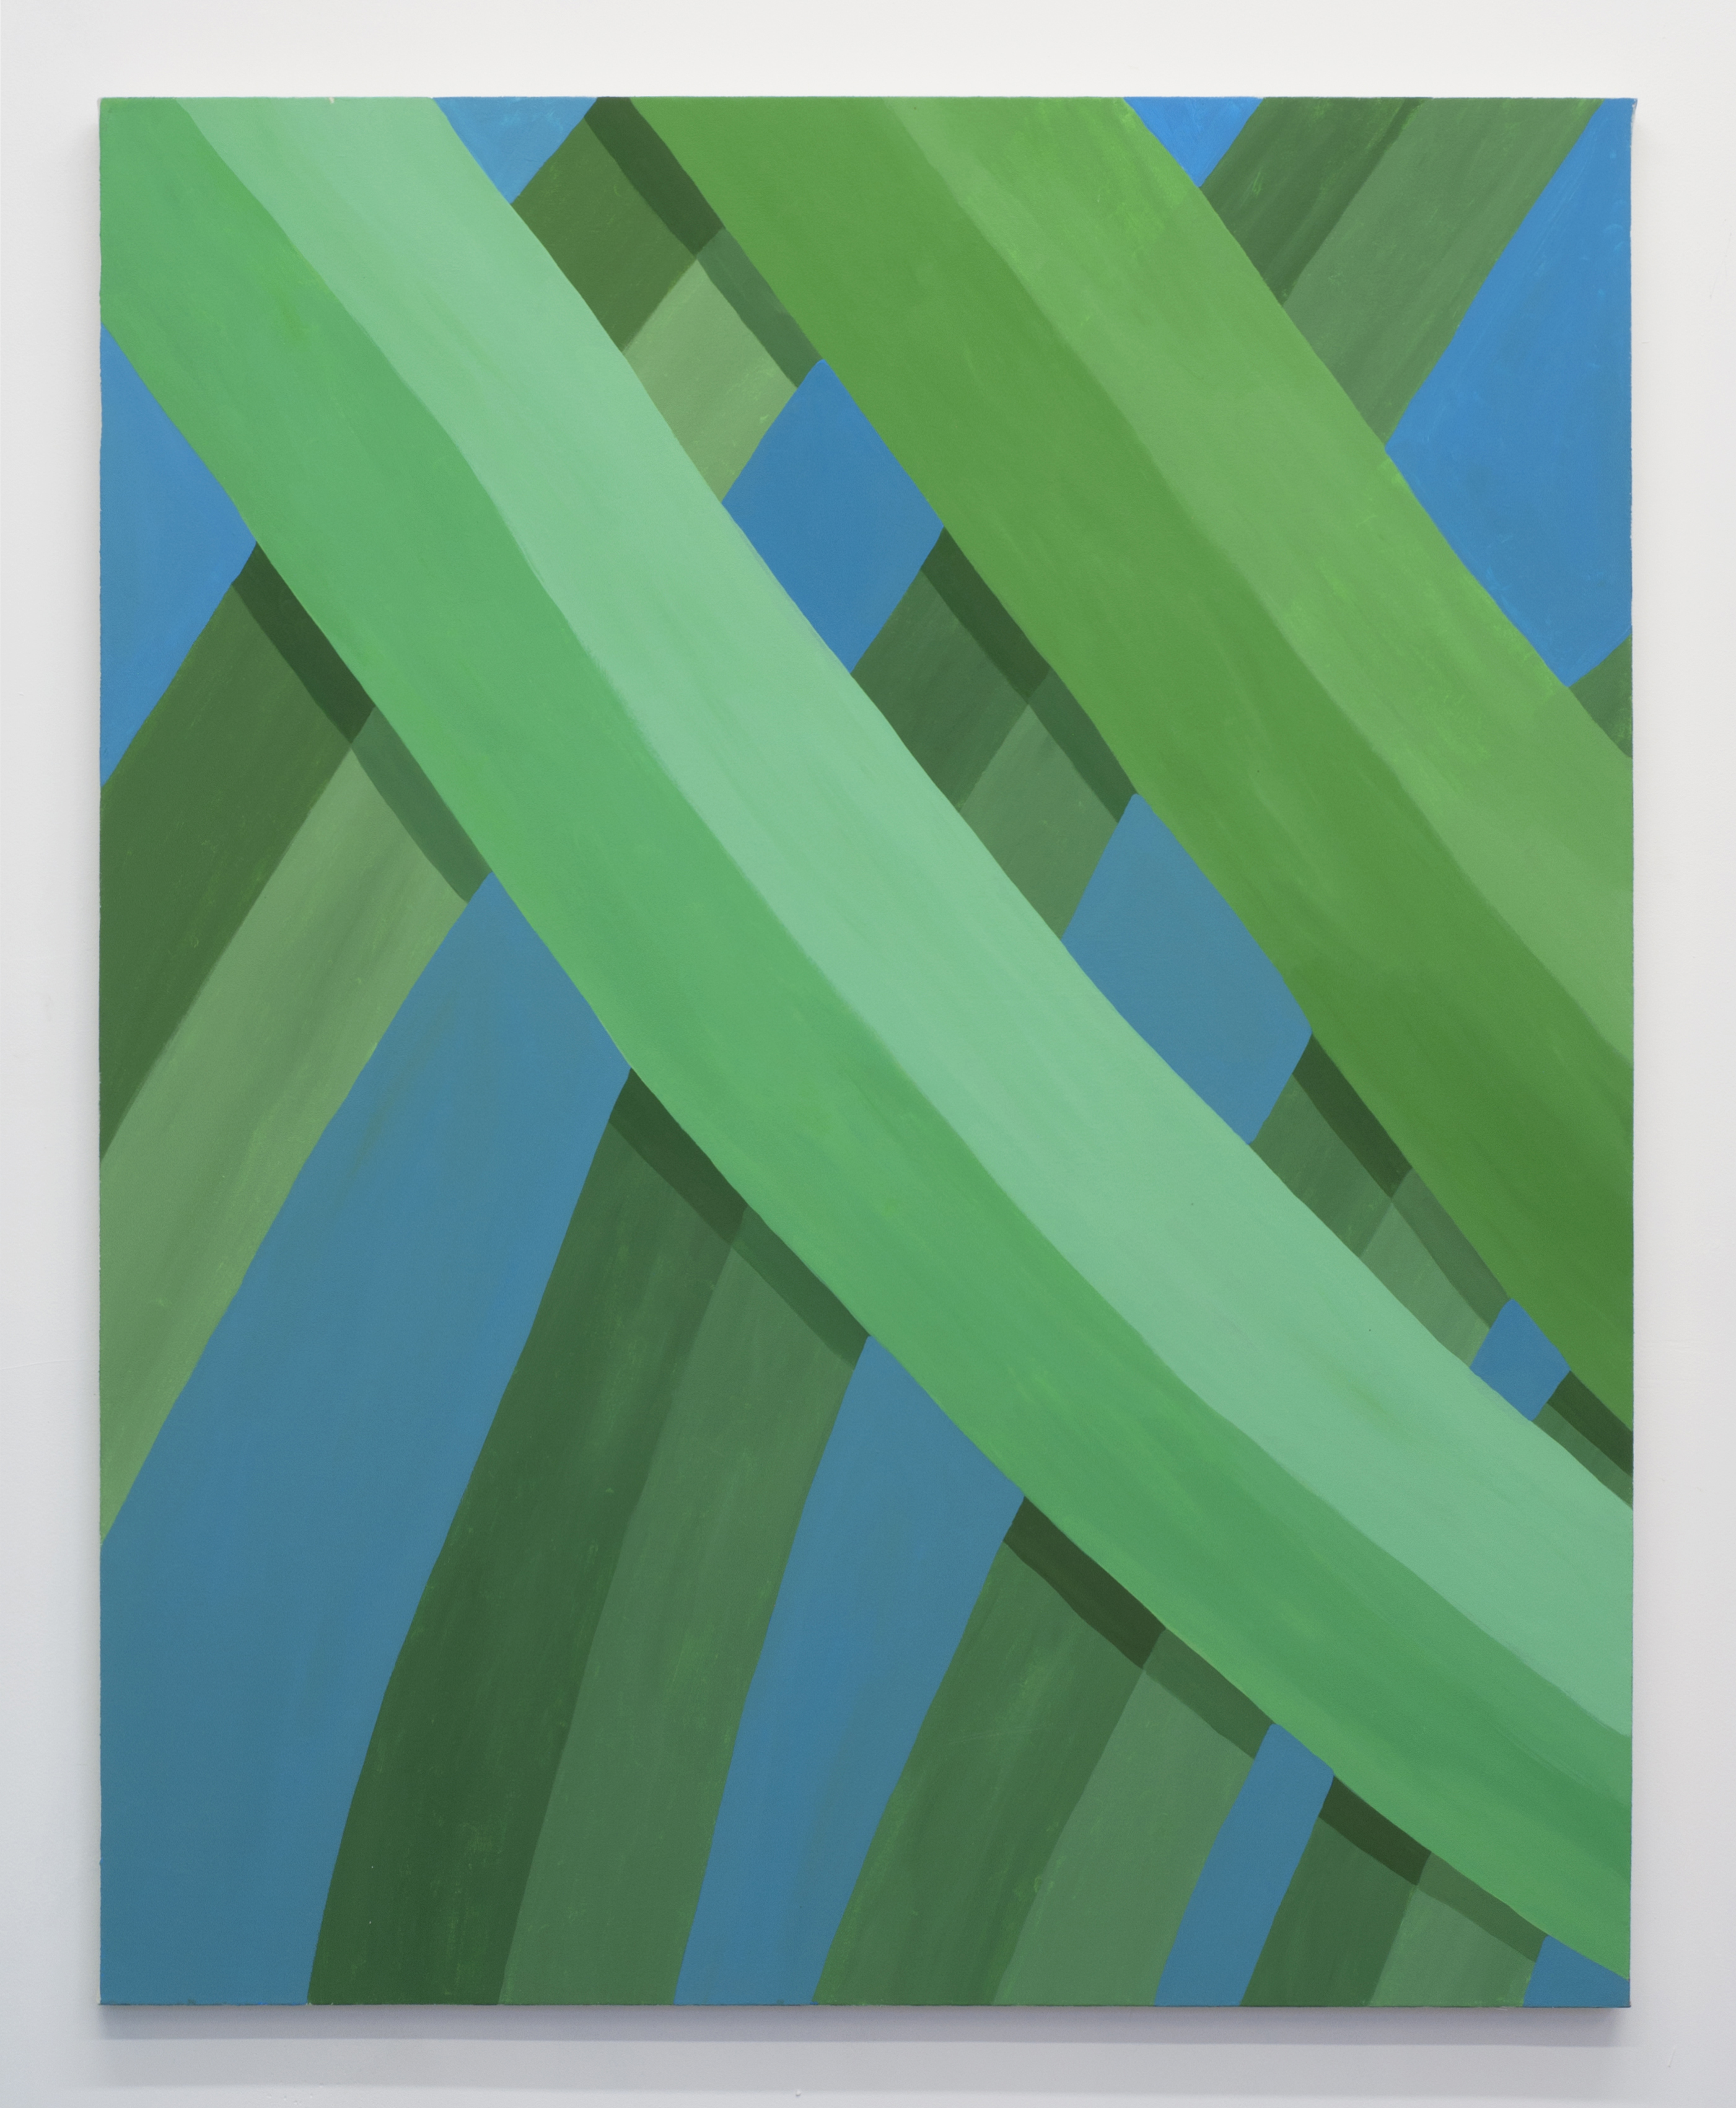 Corydon Cowansage, Grass 44, 2015, acrylic on canvas, 50 x 40 inches